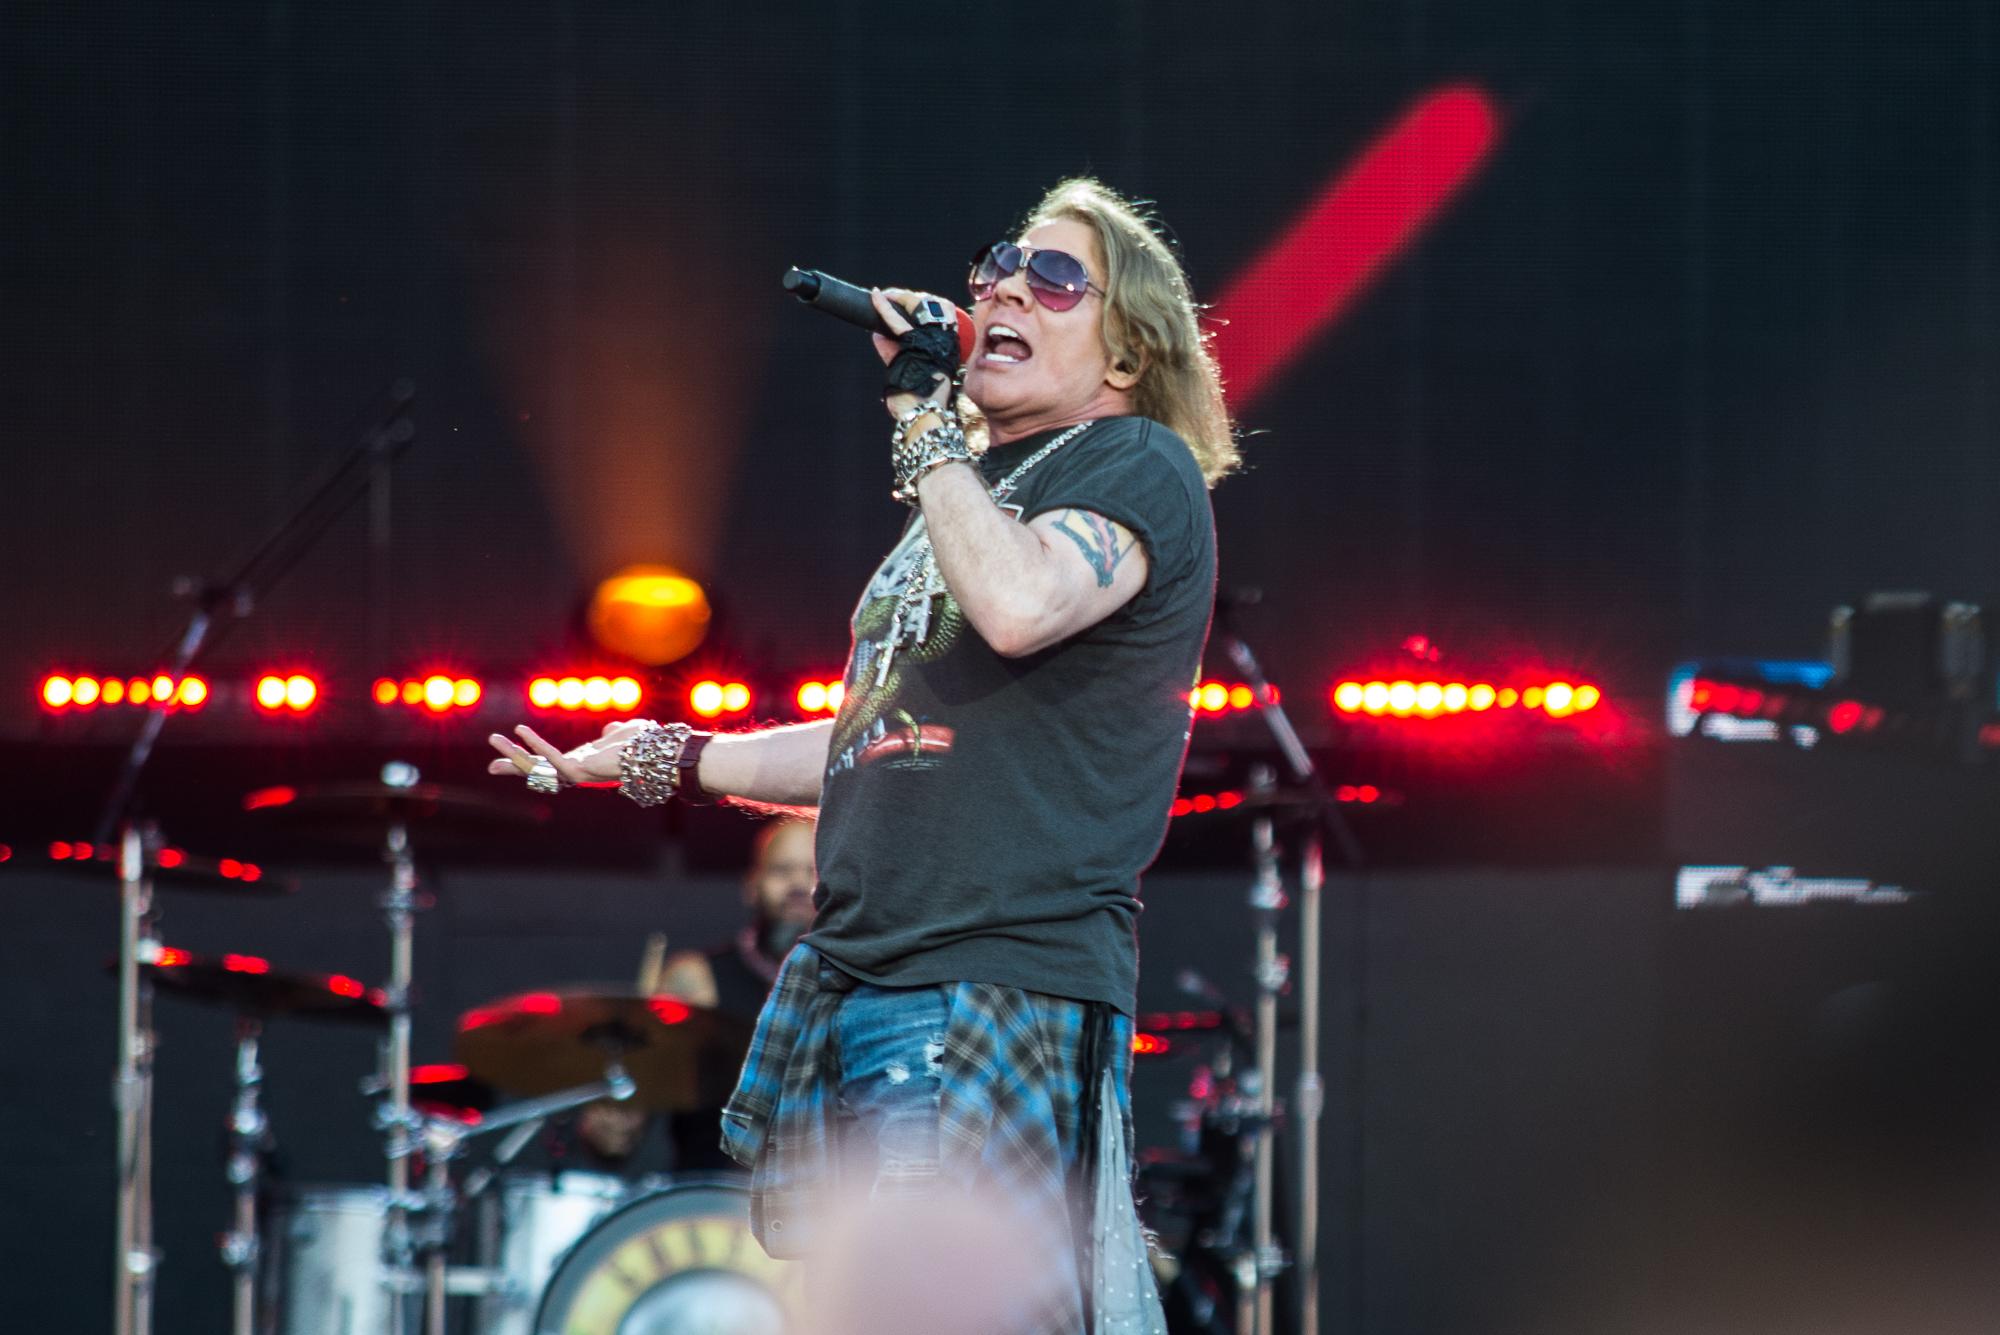 Guns N' Roses: So war das Konzert in München